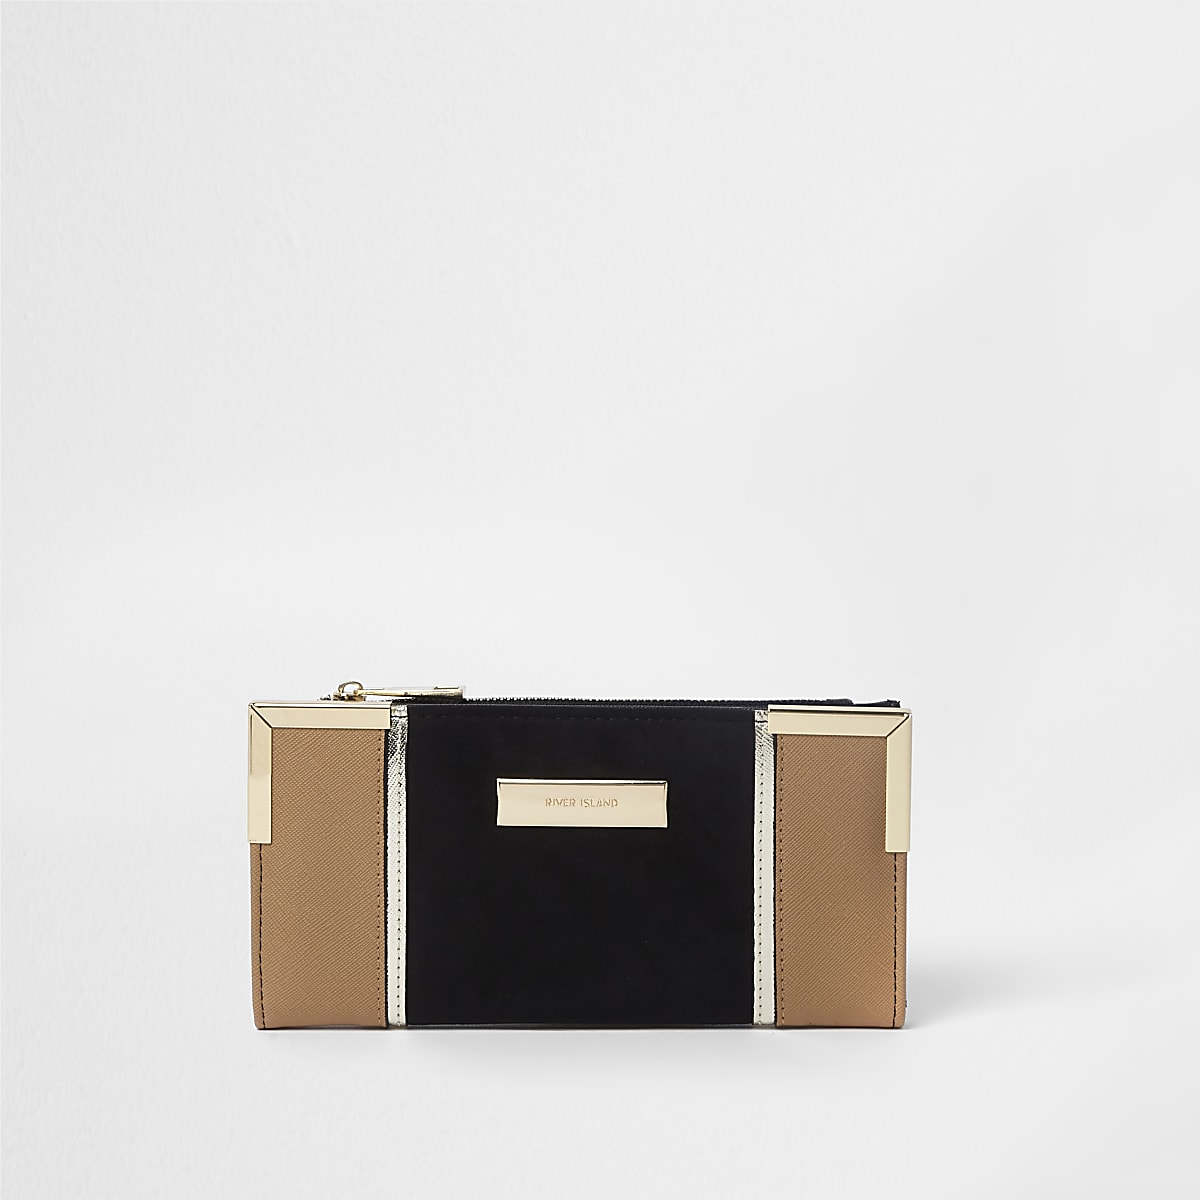 Black and tan panelled slim foldout purse